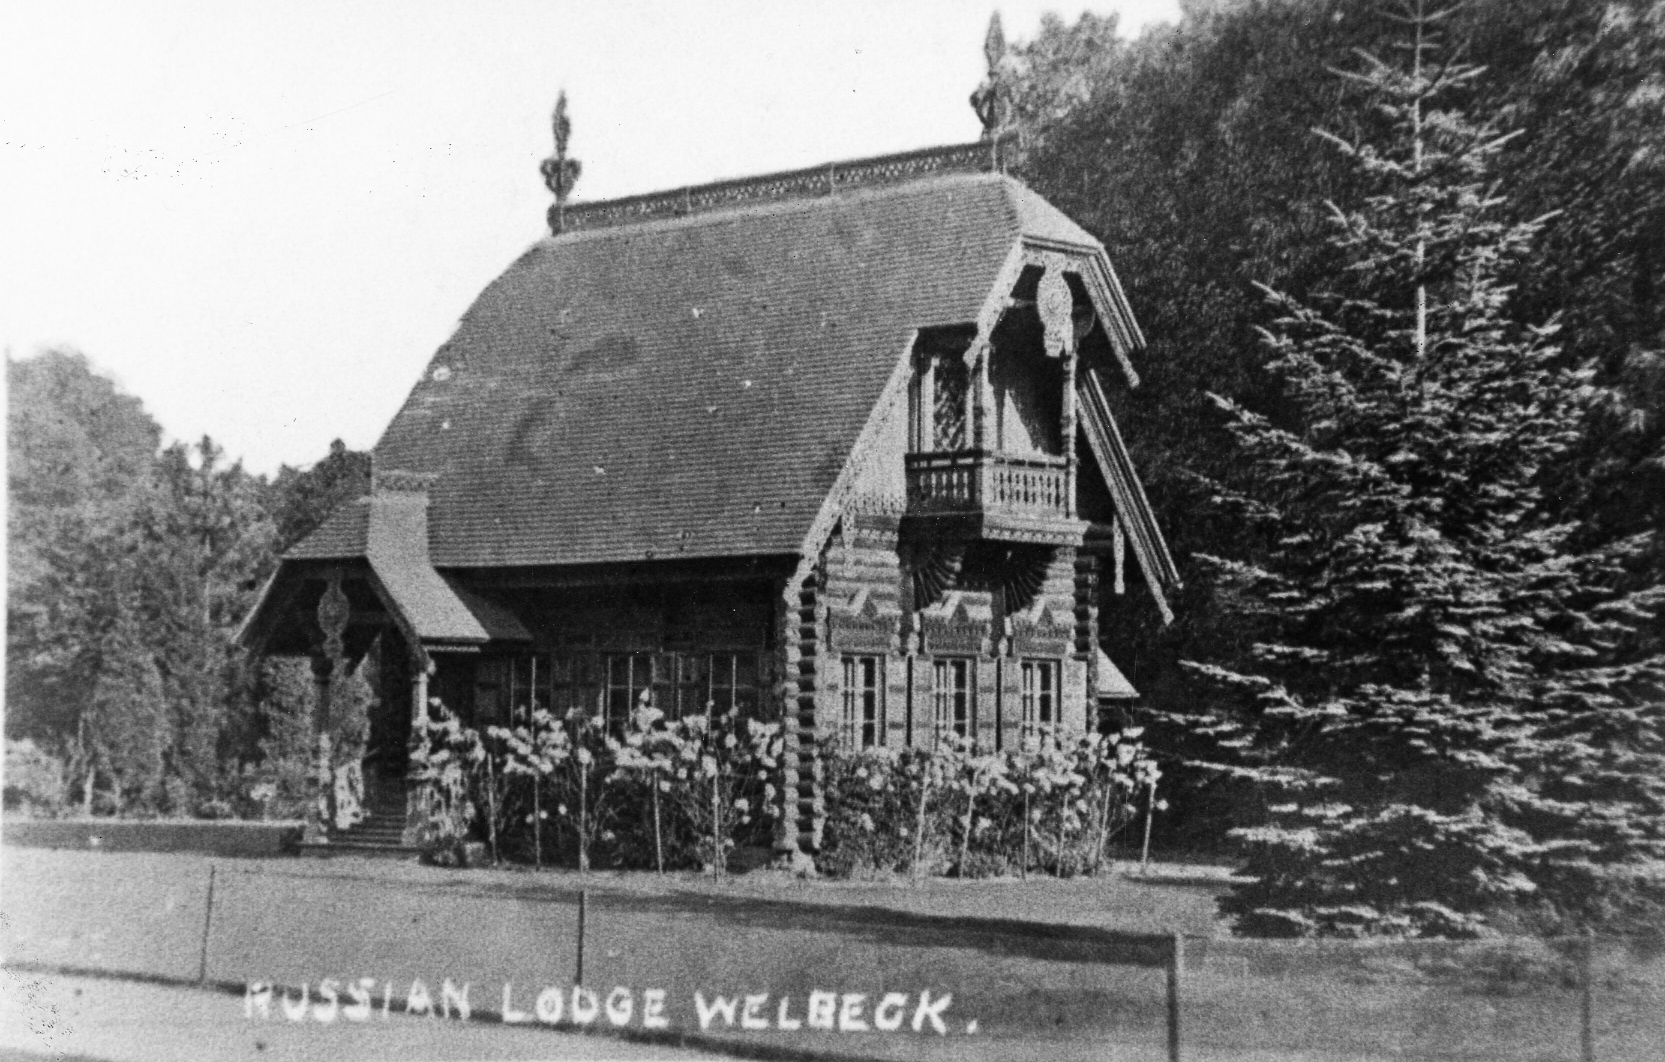 Russian Lodge Welbeck n.d.